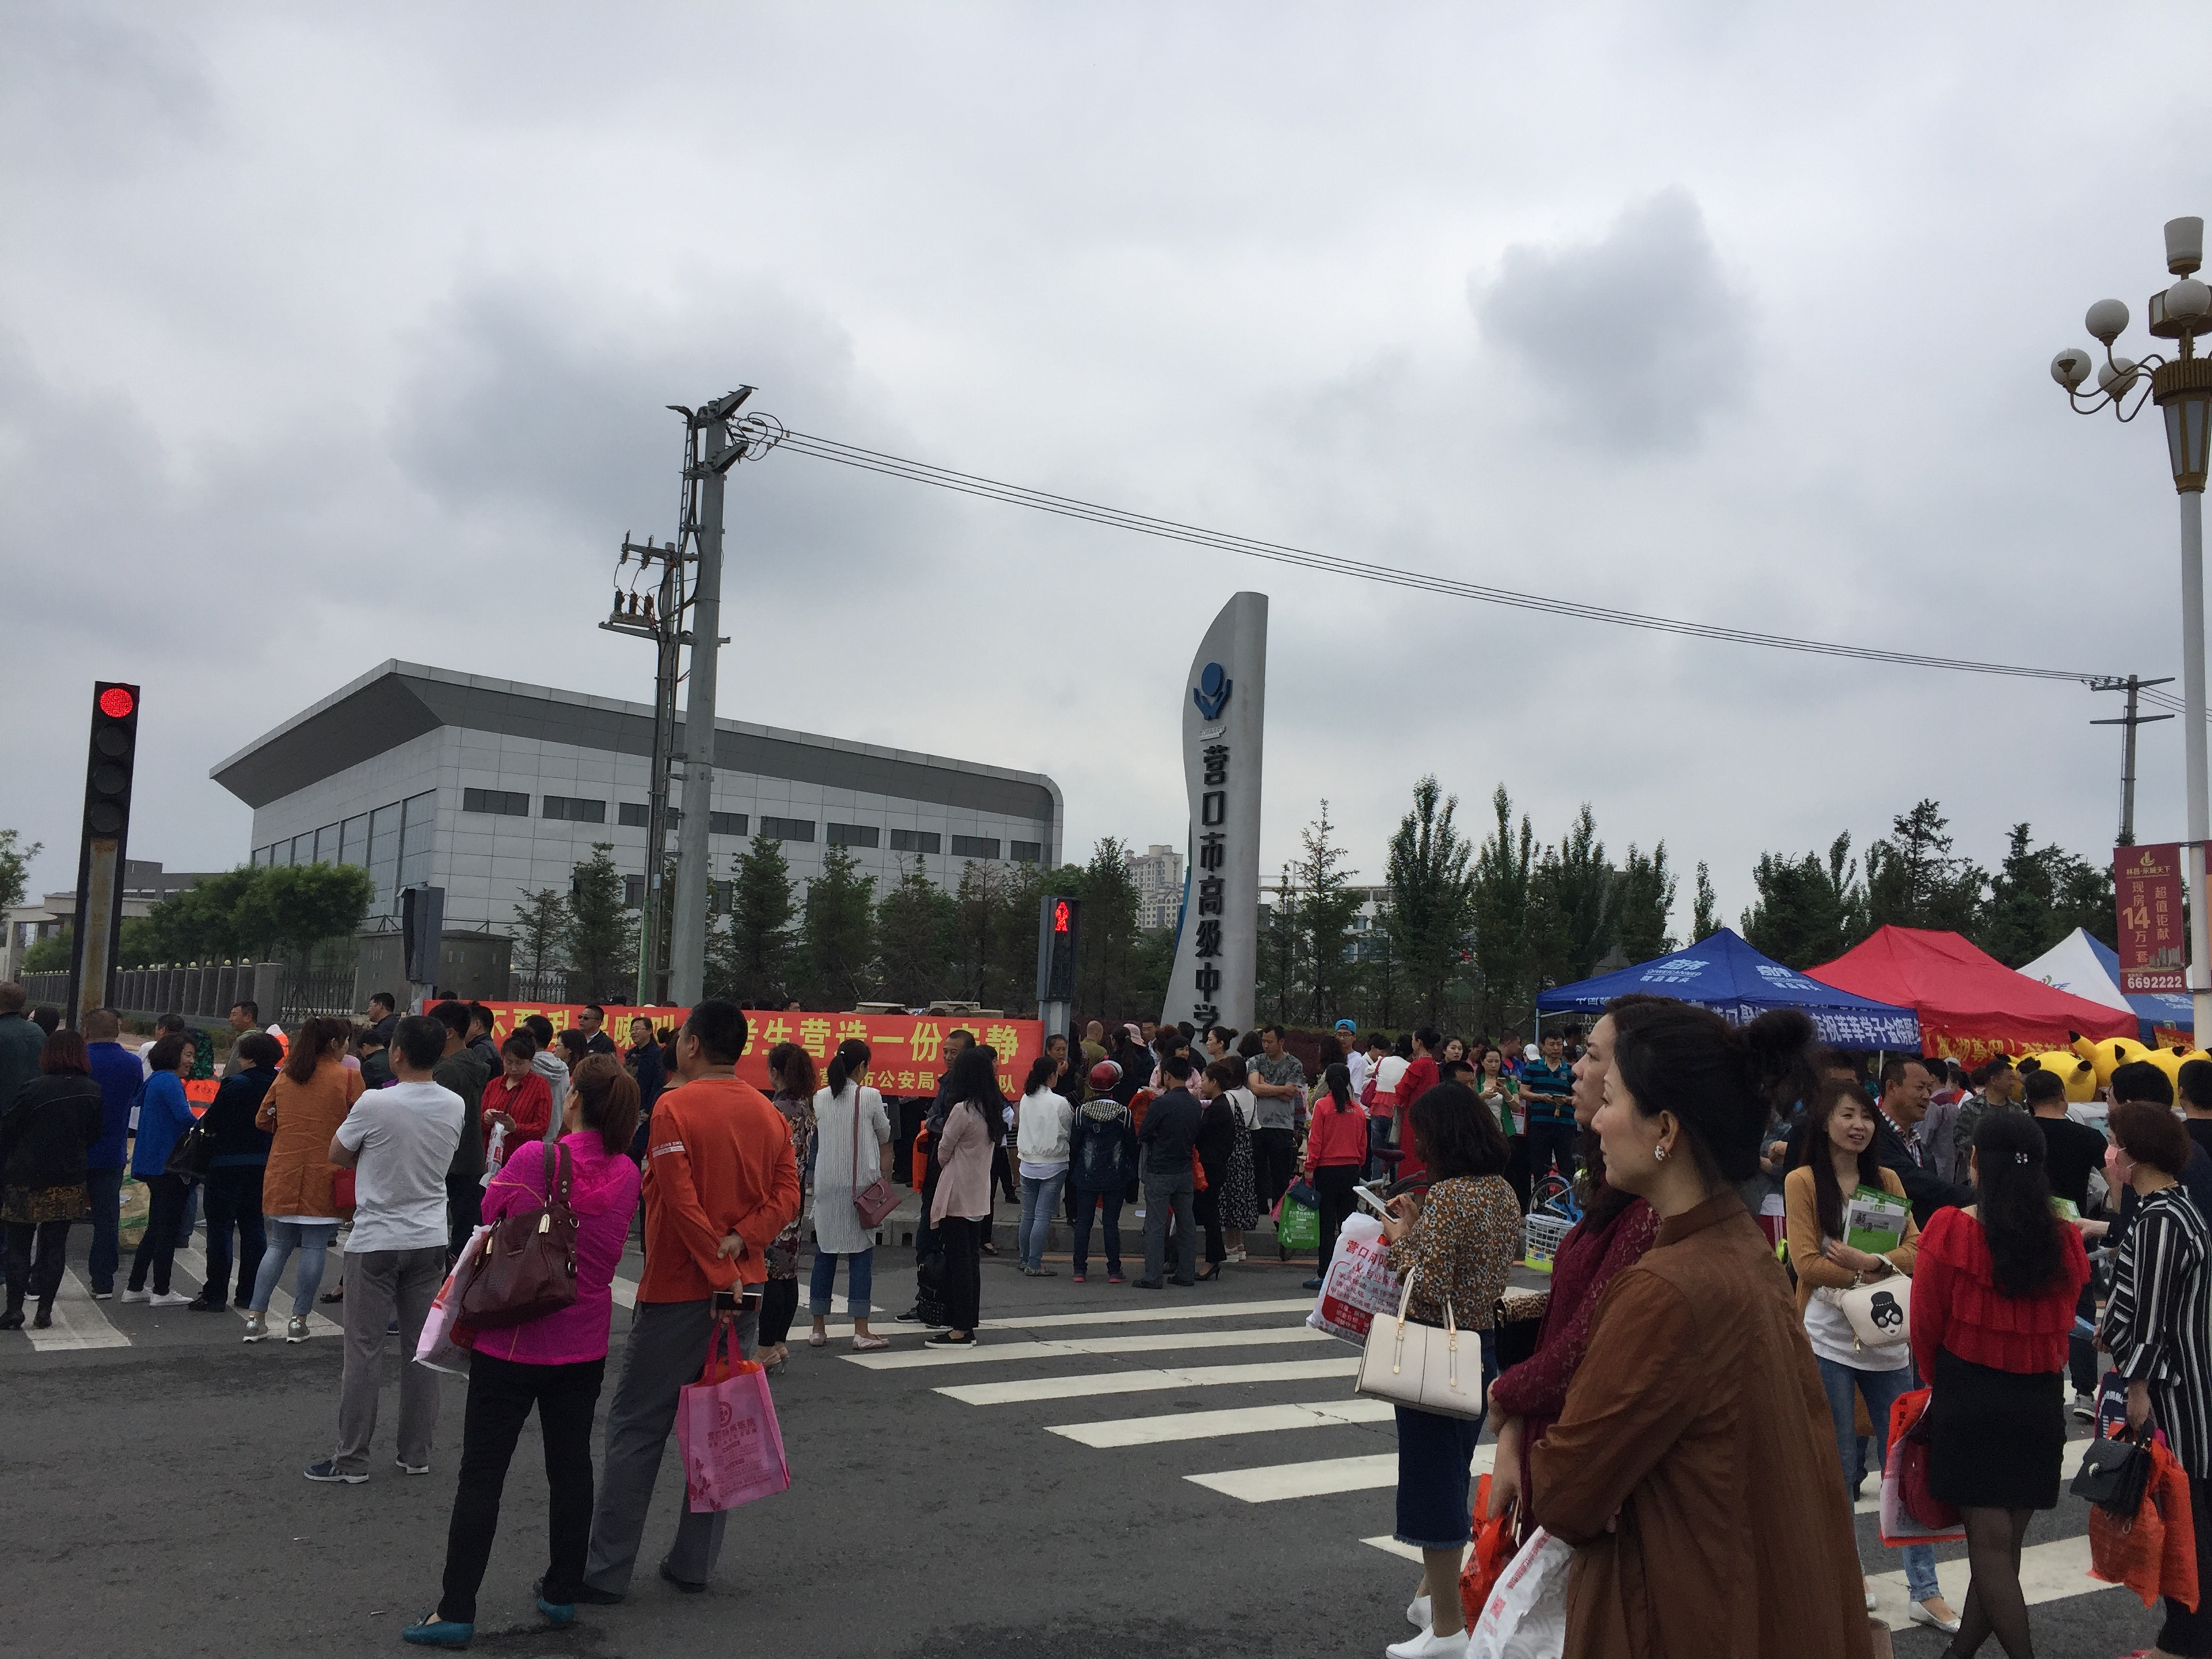 <b>辽宁工程技术大学营销管理学院与专业介绍</b>